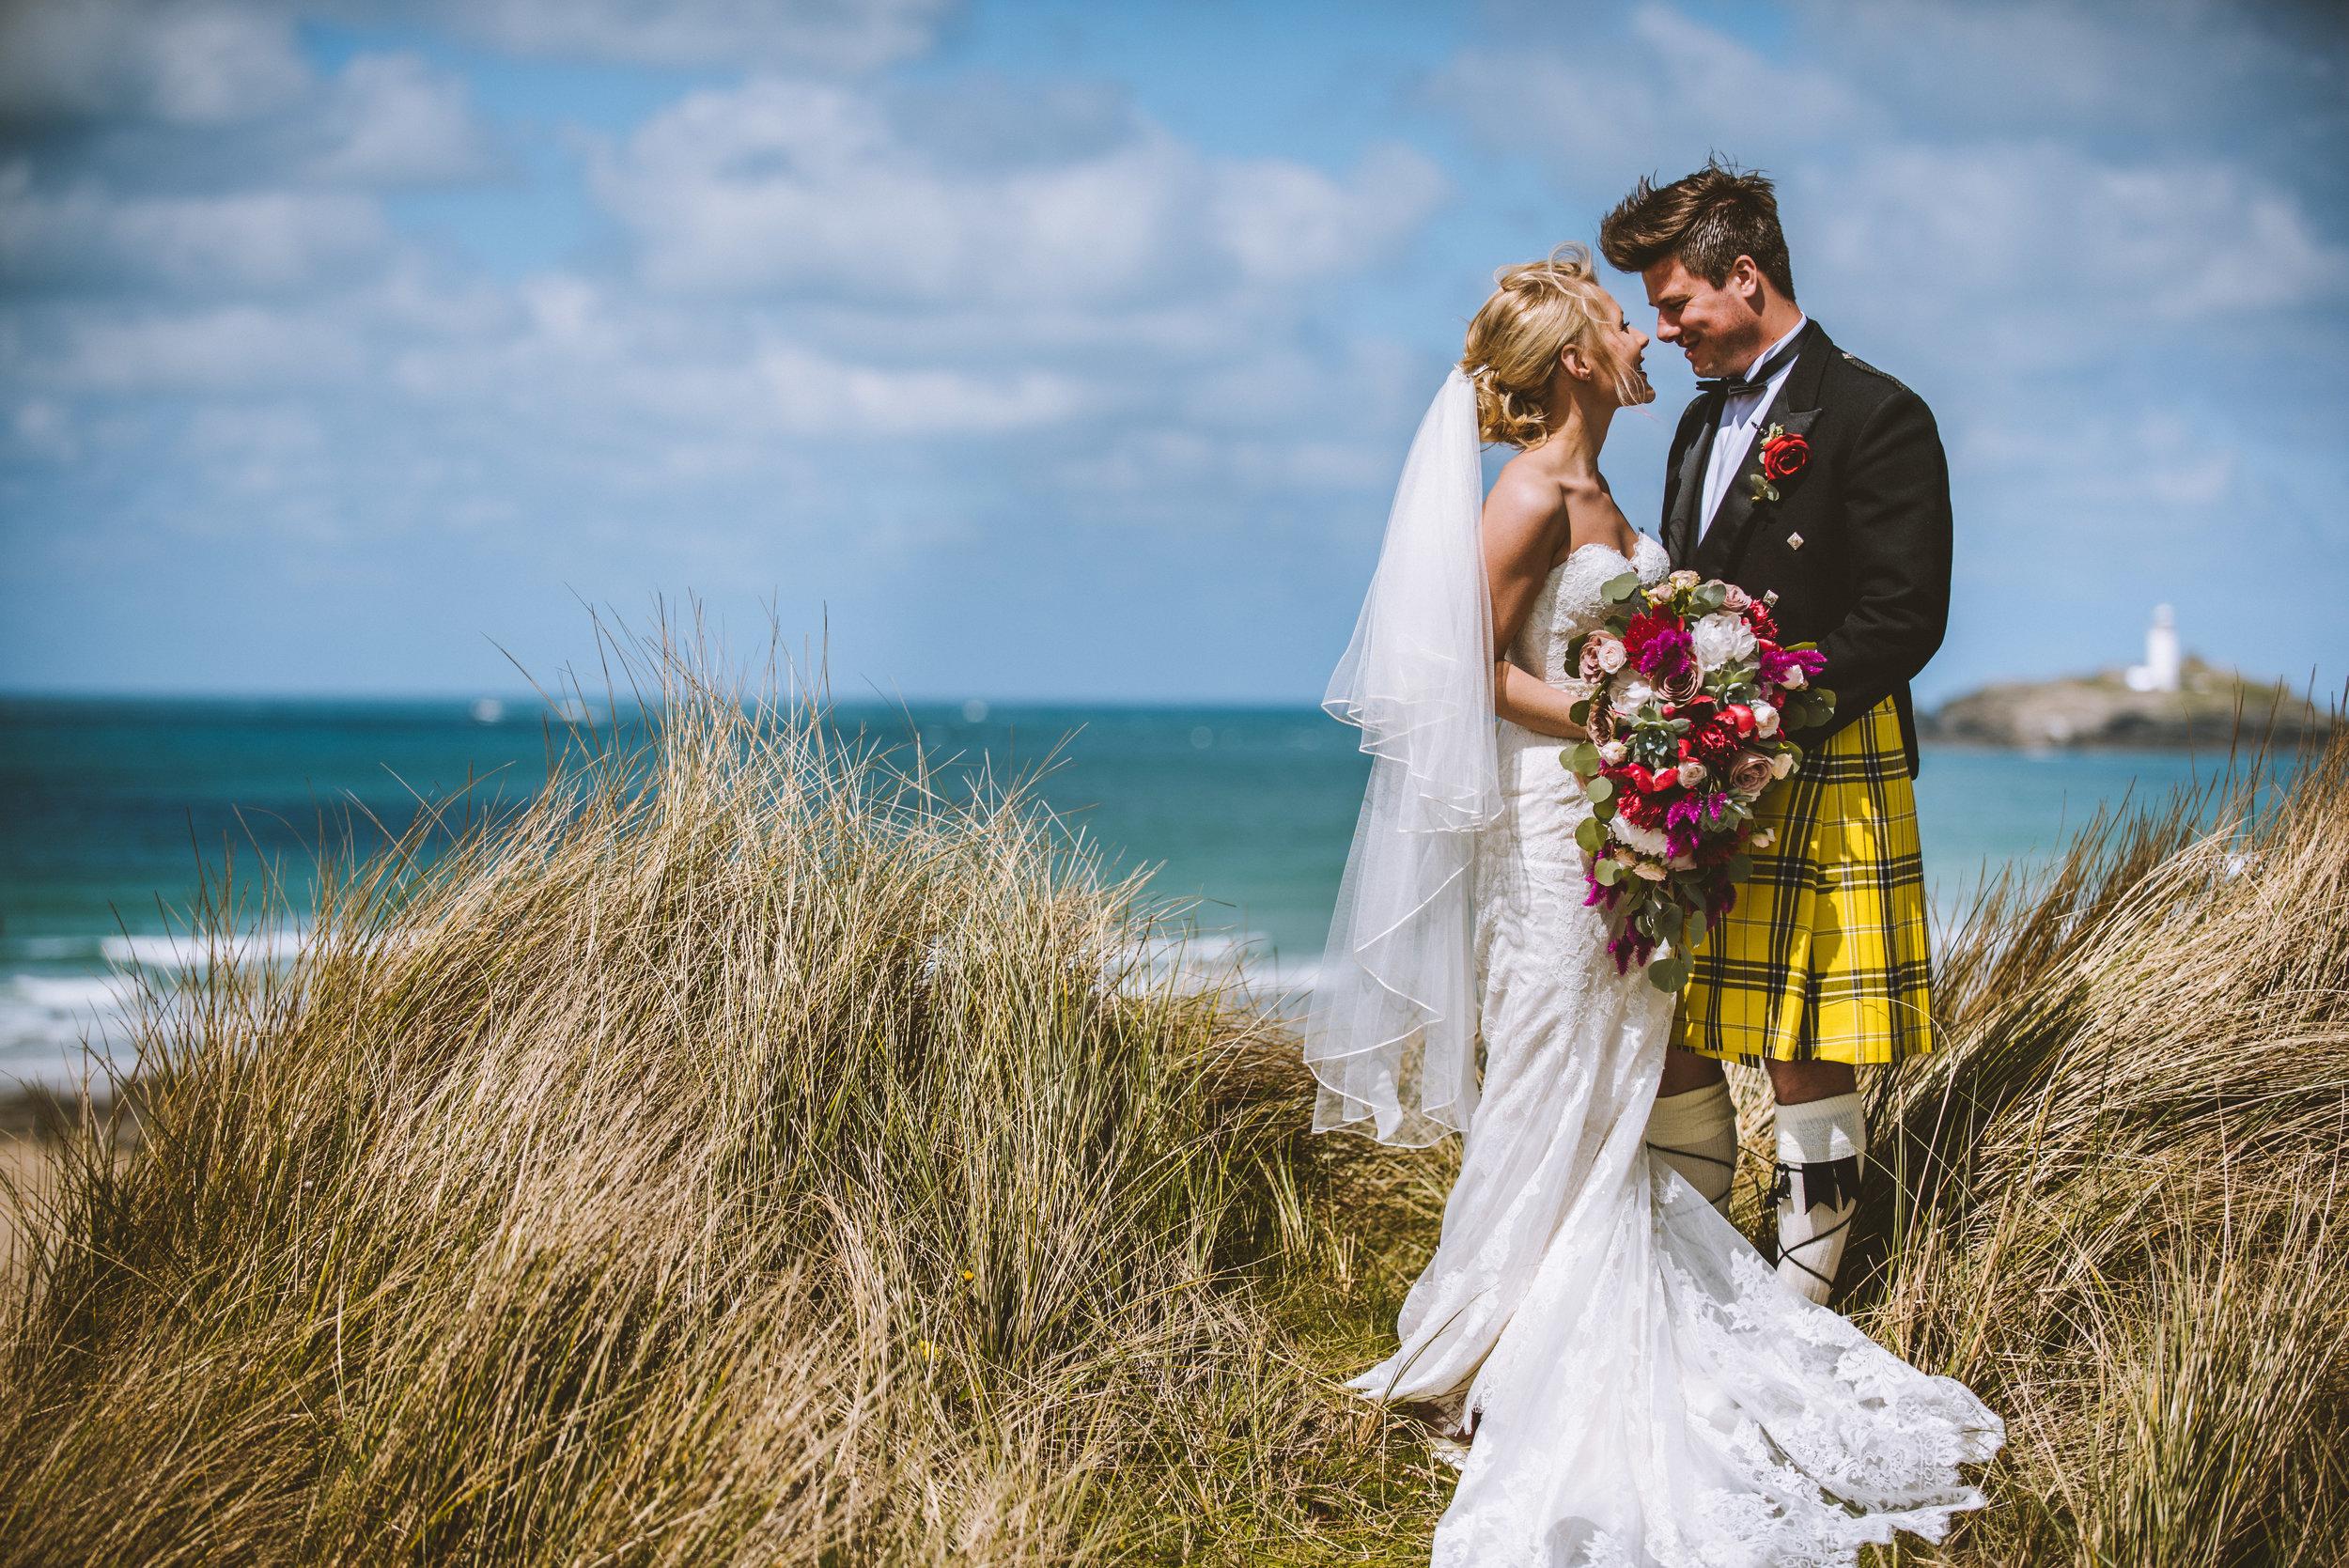 mark-shaw-photography-wedding-9.jpg